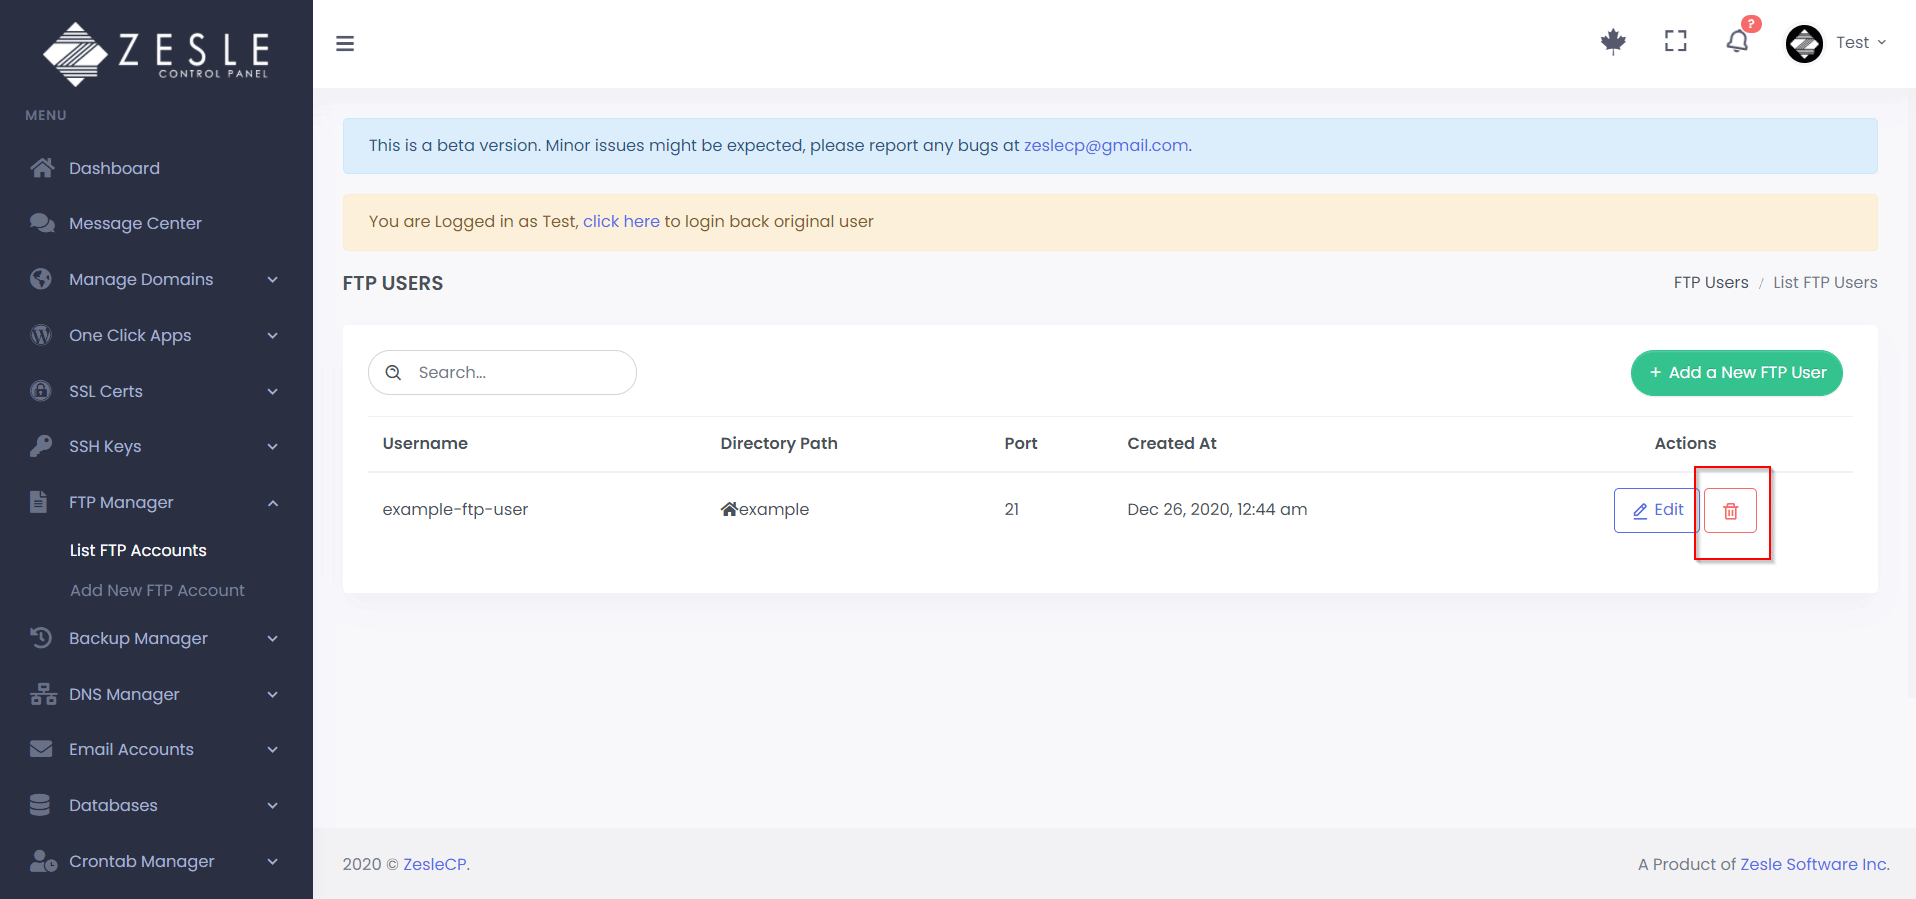 Delete FTP user with ZesleCP